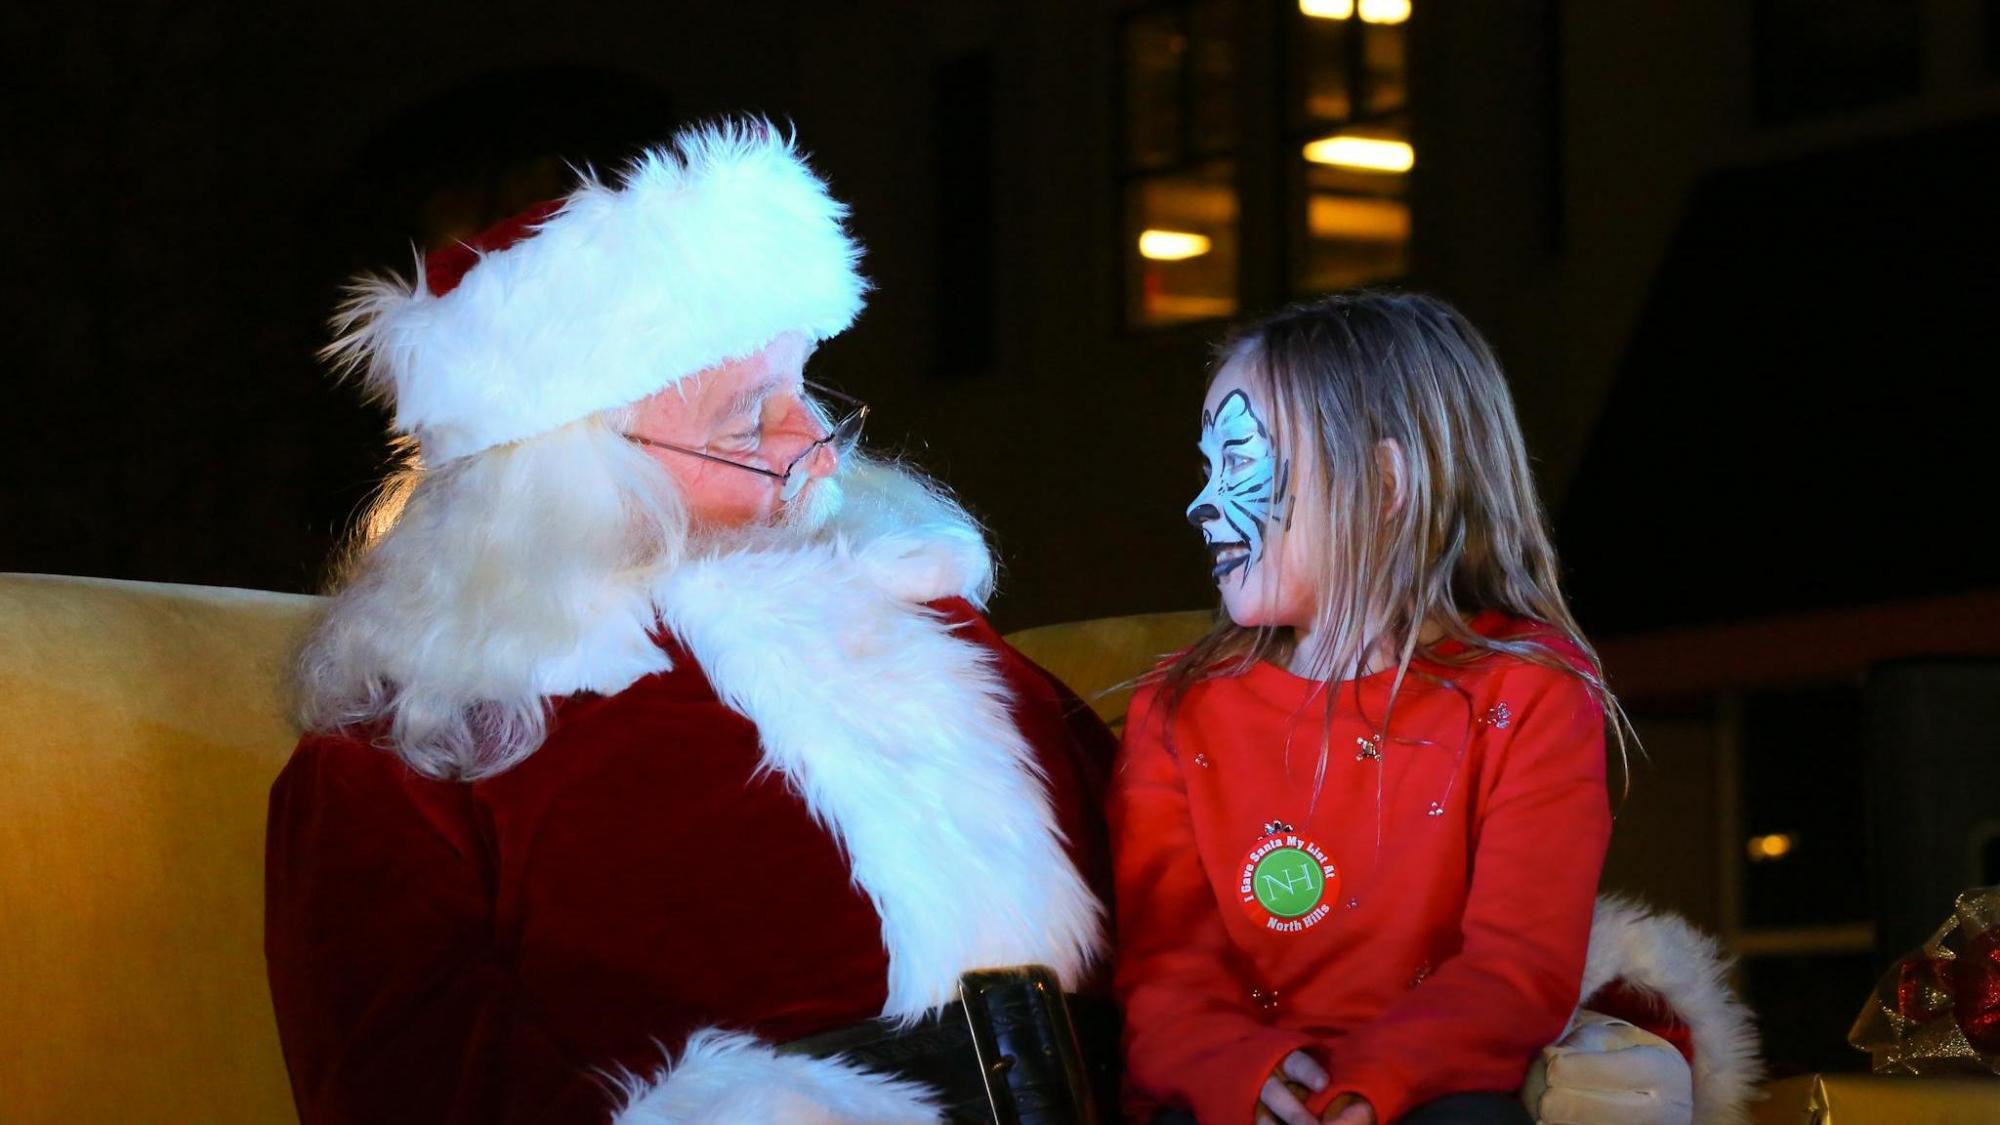 Wilson Nc Christmas Parade 2020 Review Triangle Christmas parades, Raleigh, Durham, Cary, Carrboro